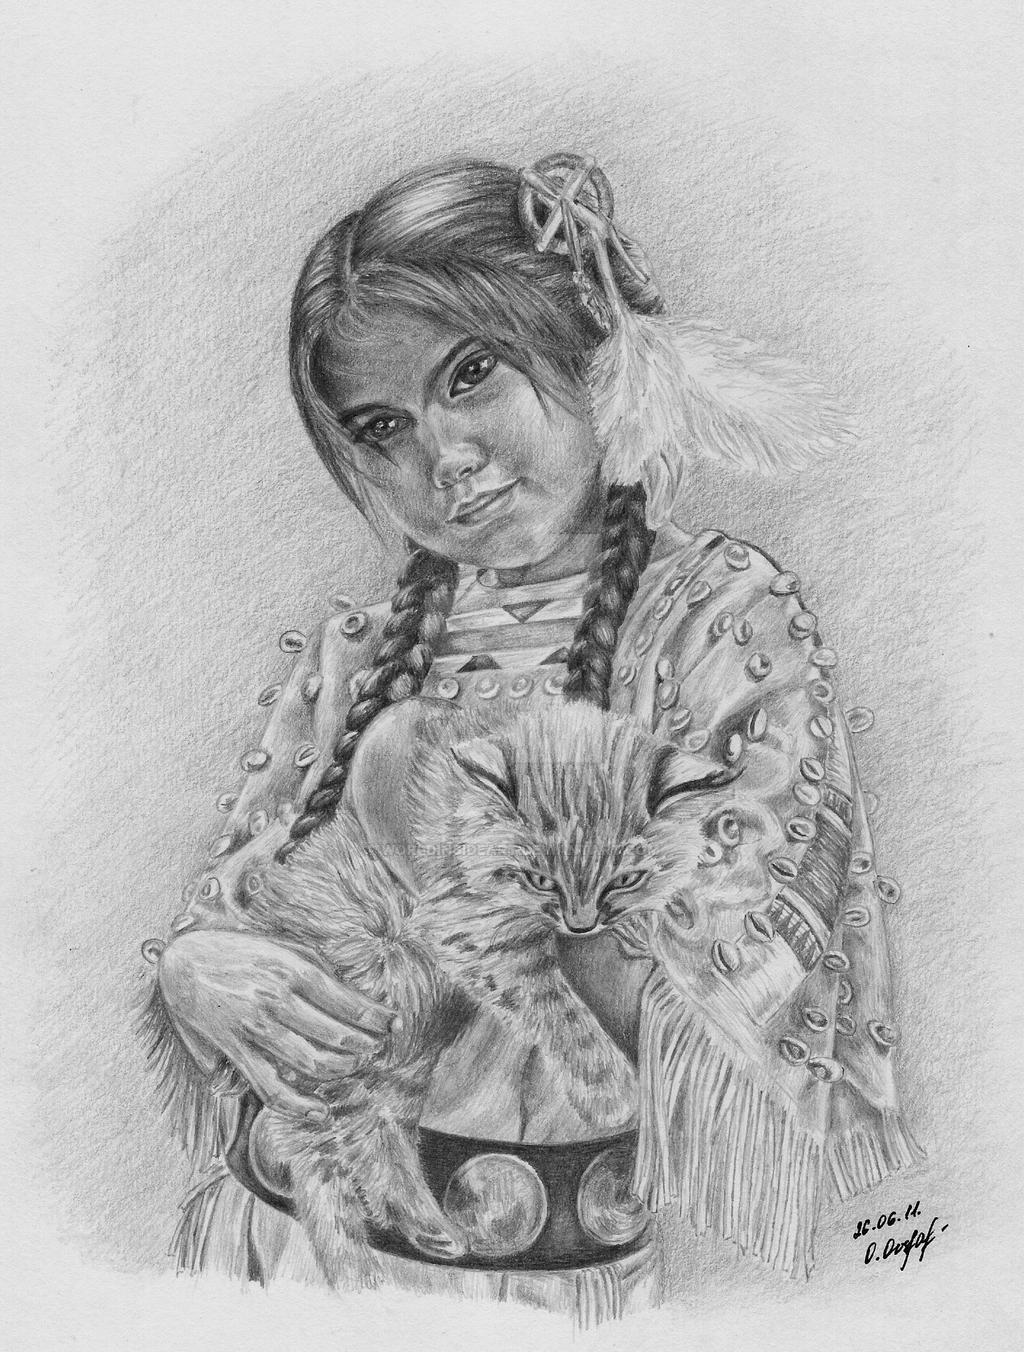 Native American girl by Worldinsideart on DeviantArt